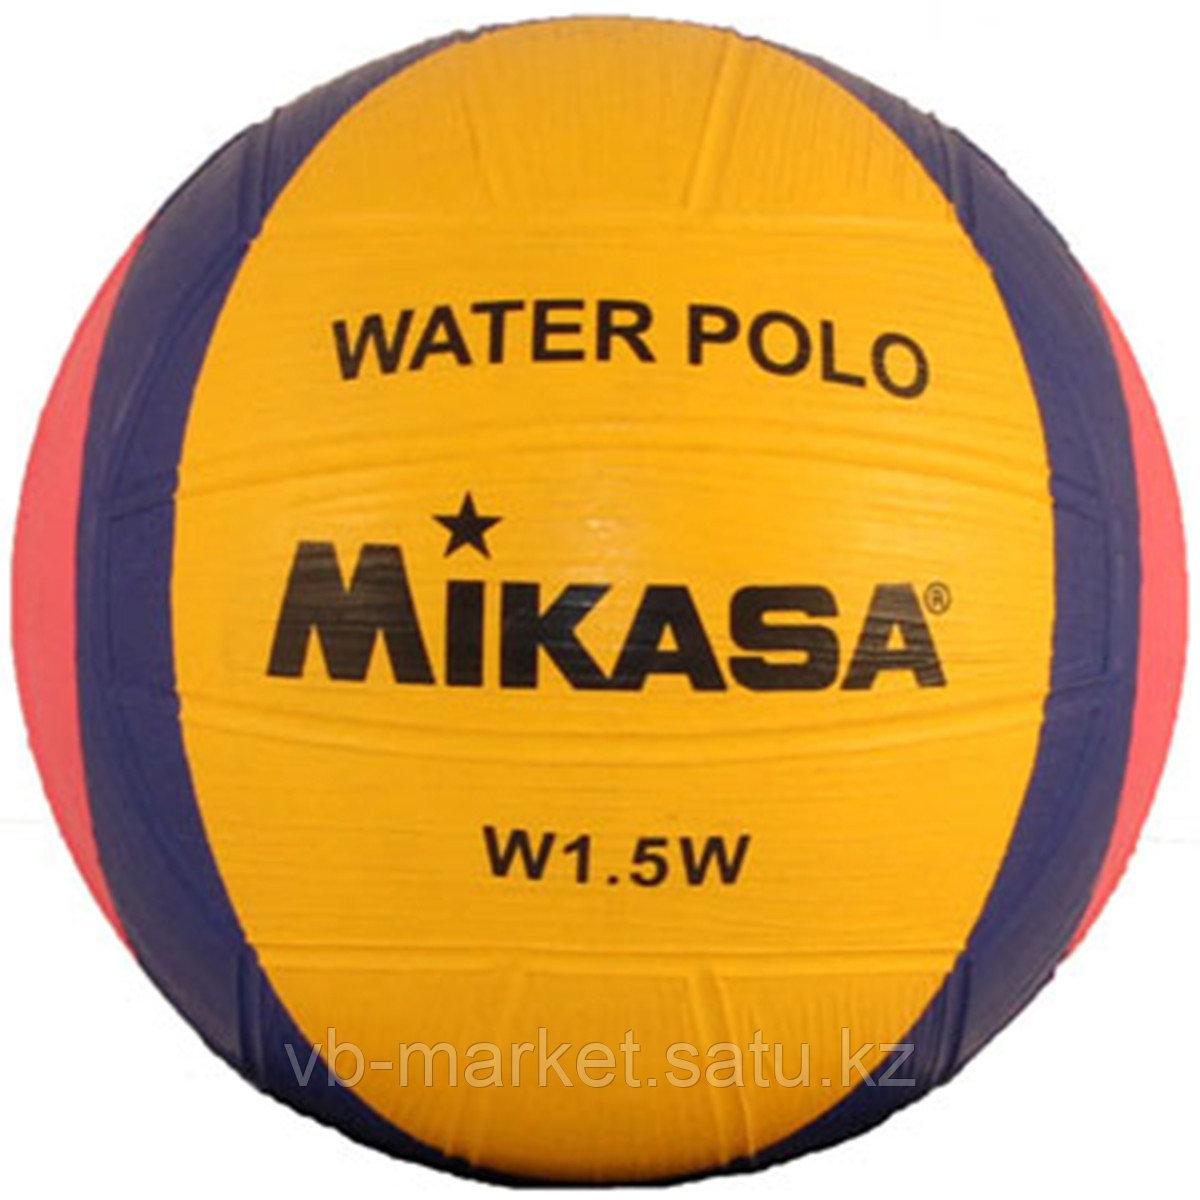 Сувенирный мяч для водного поло MIKASA W1.5W